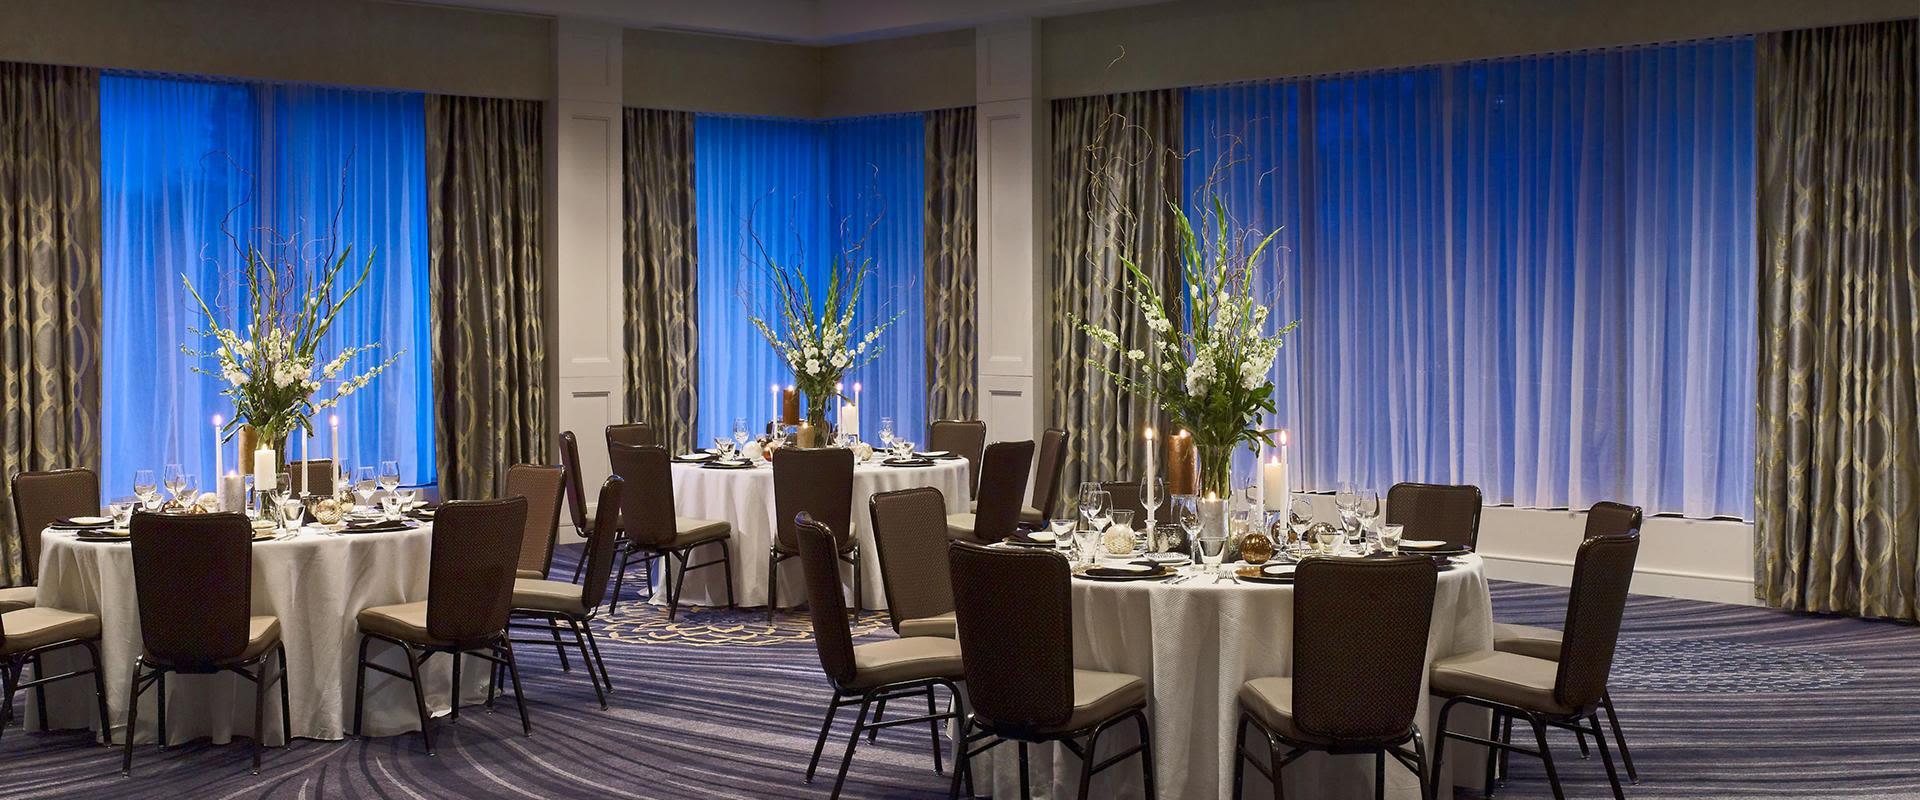 Charlotte Hotel Ballroom Venue Circular Tables